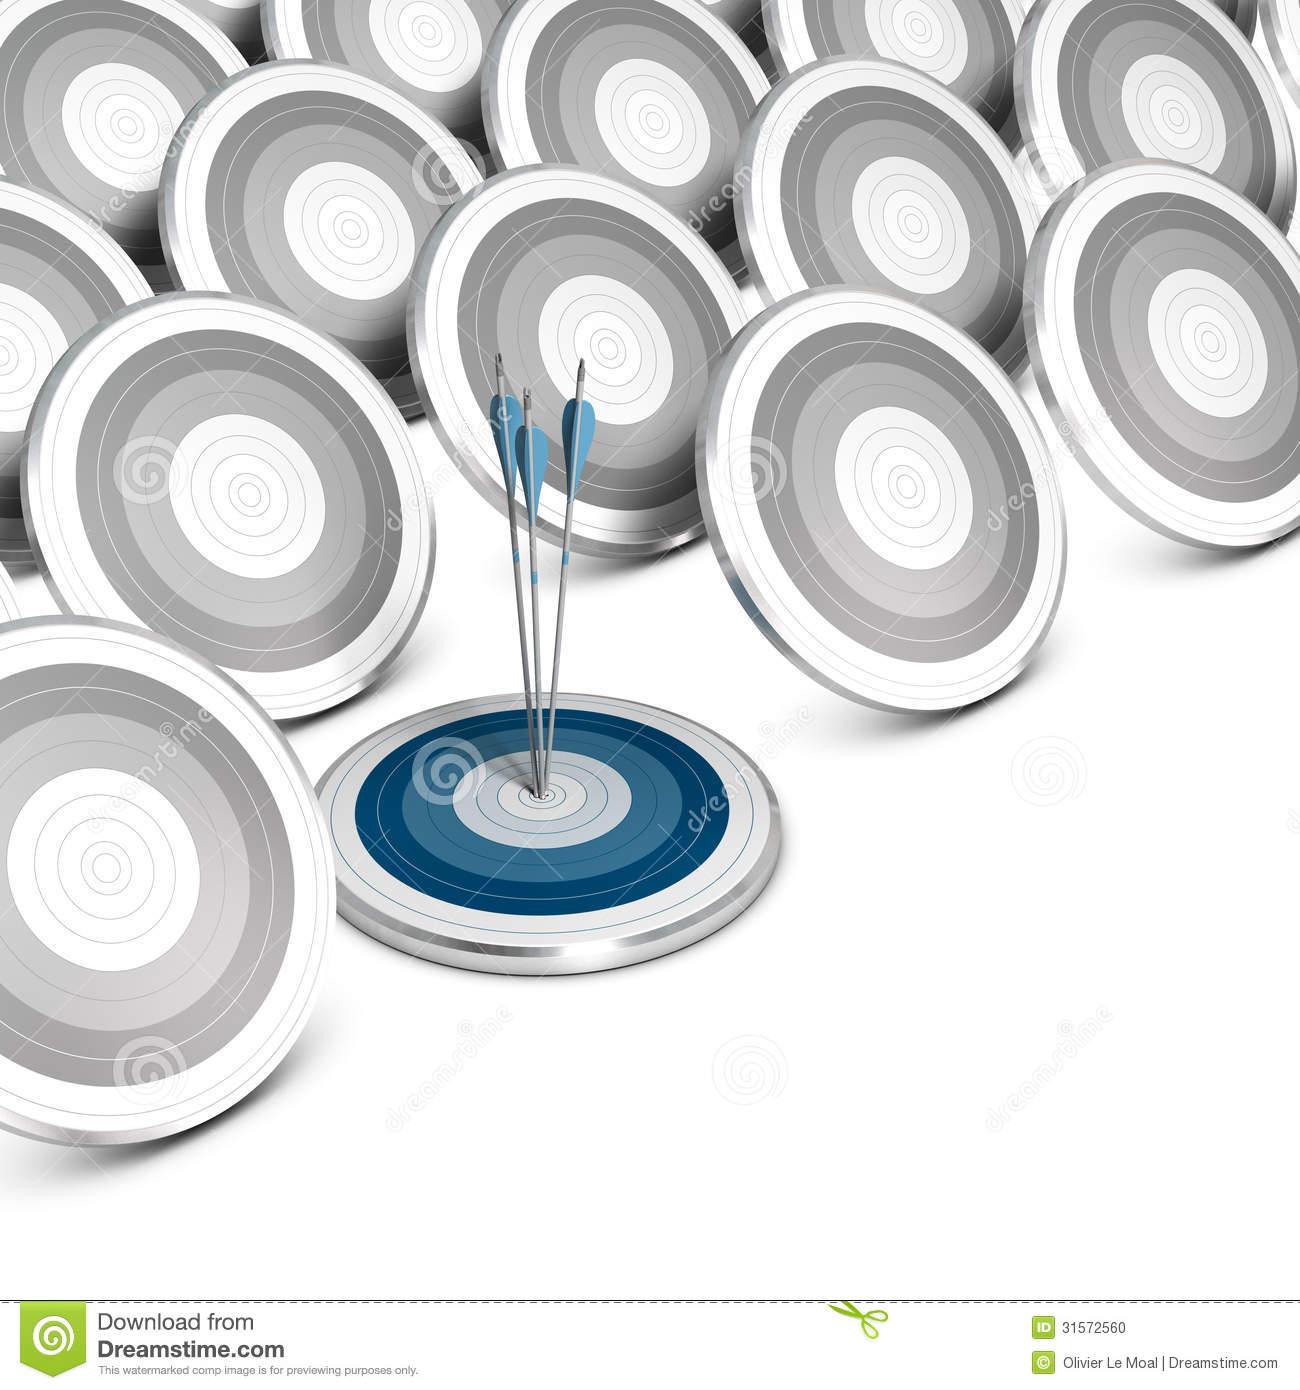 Market Segmentation, Targeting And Positioning. Stock Photo.